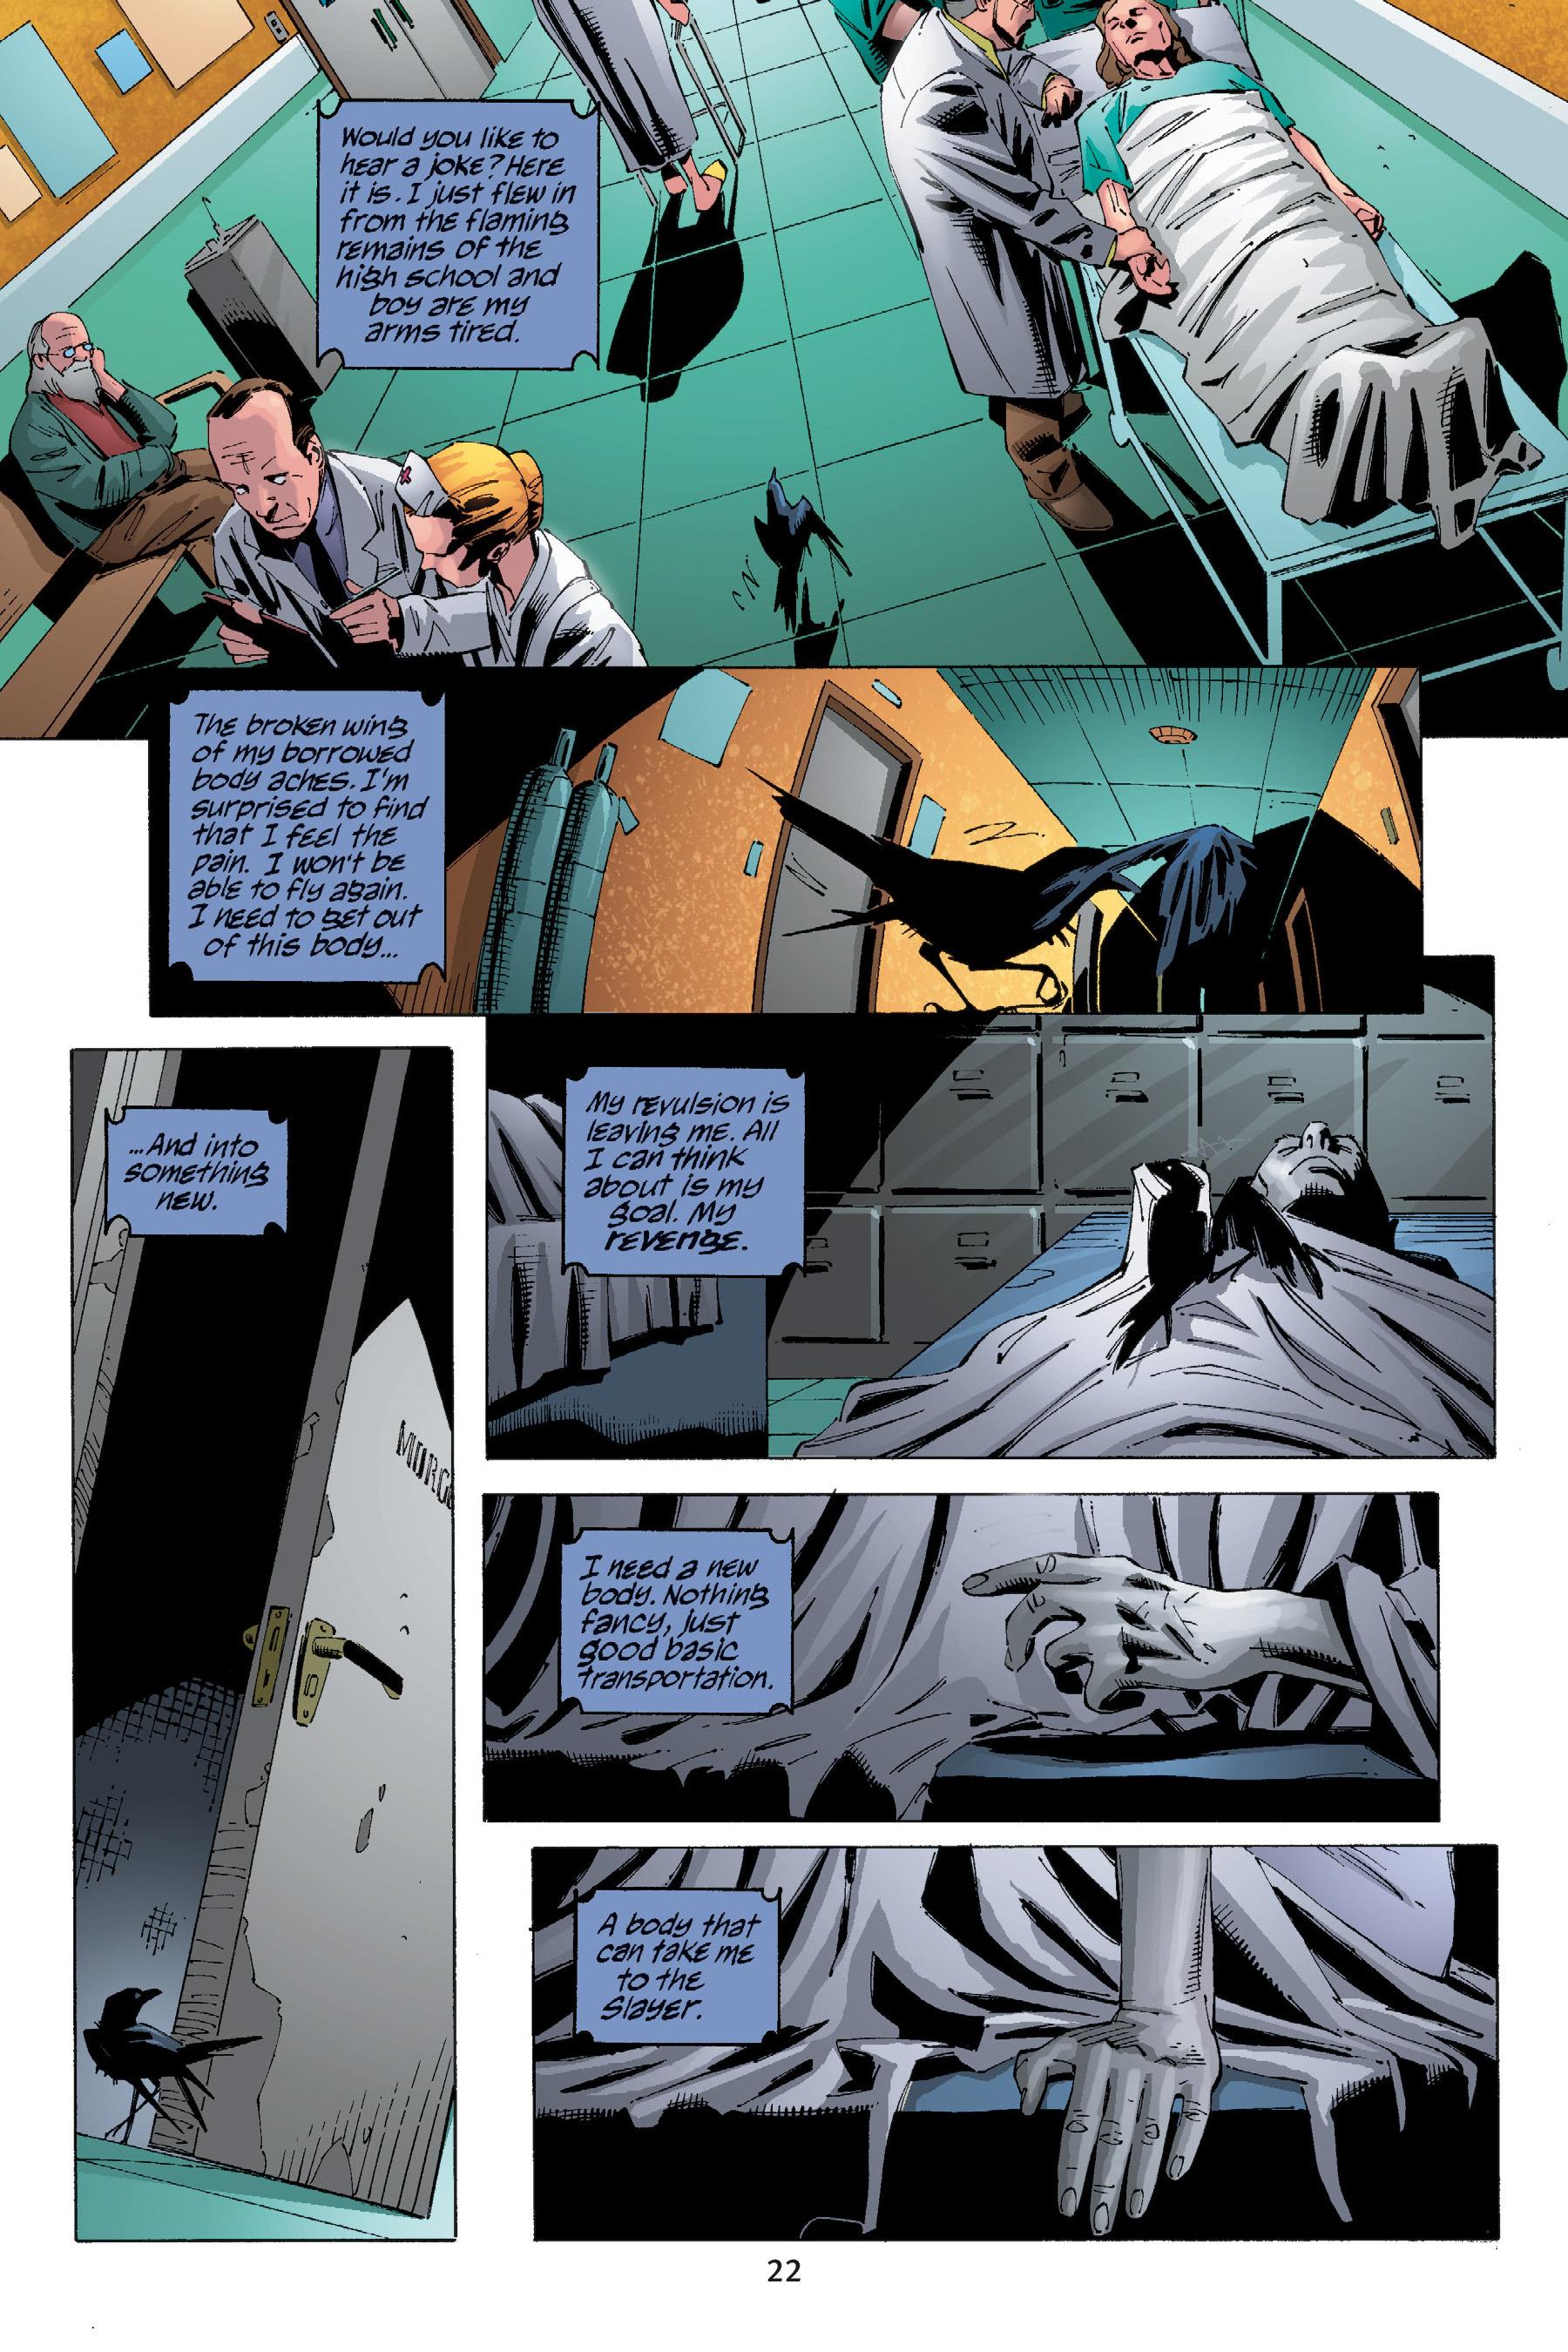 Read online Buffy the Vampire Slayer: Omnibus comic -  Issue # TPB 5 - 23